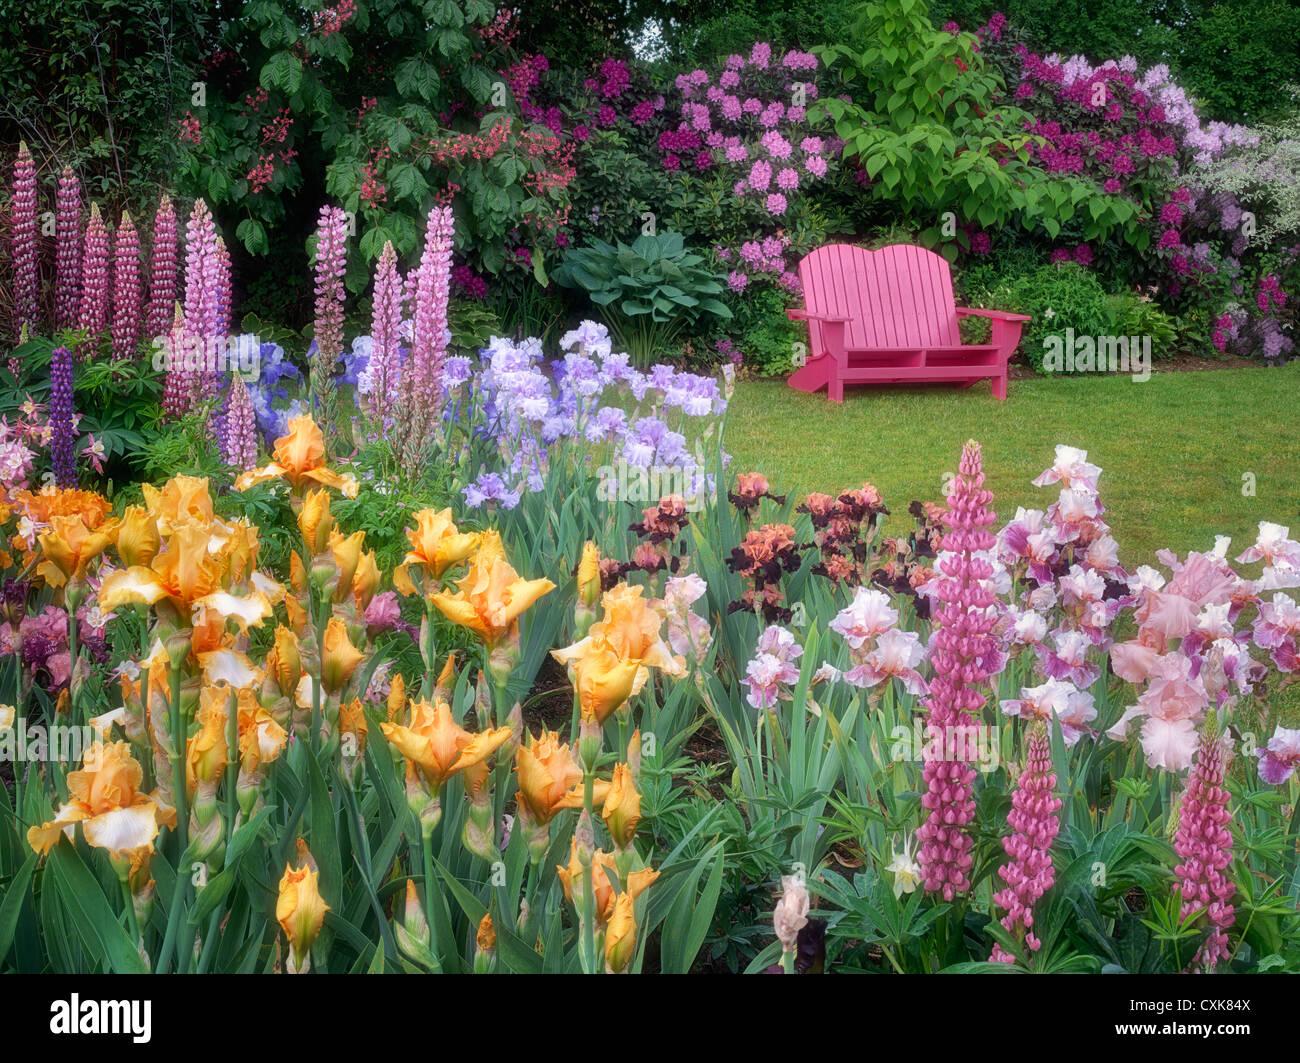 Flower garden stock photos flower garden stock images alamy garden chair and flower garden schrieners iris gardens salem oregon stock izmirmasajfo Gallery